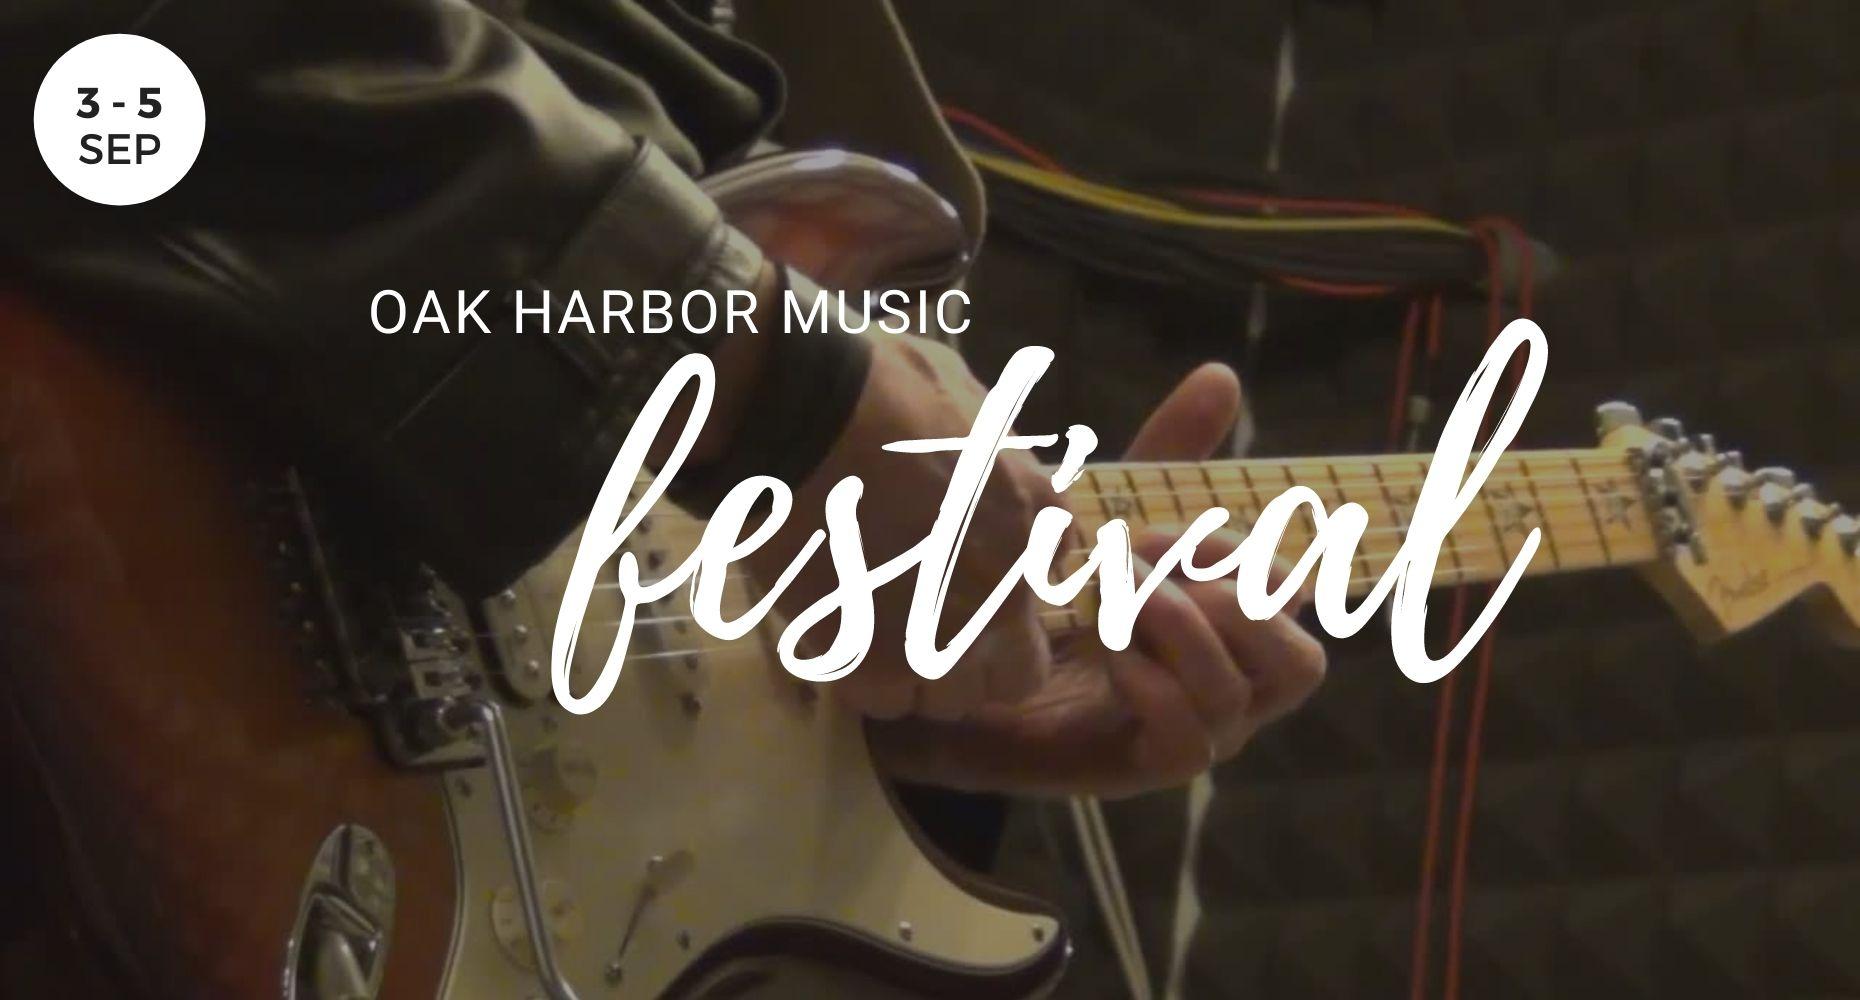 Oak Harbor Music Festival, Events, Whidbey Island, Washington